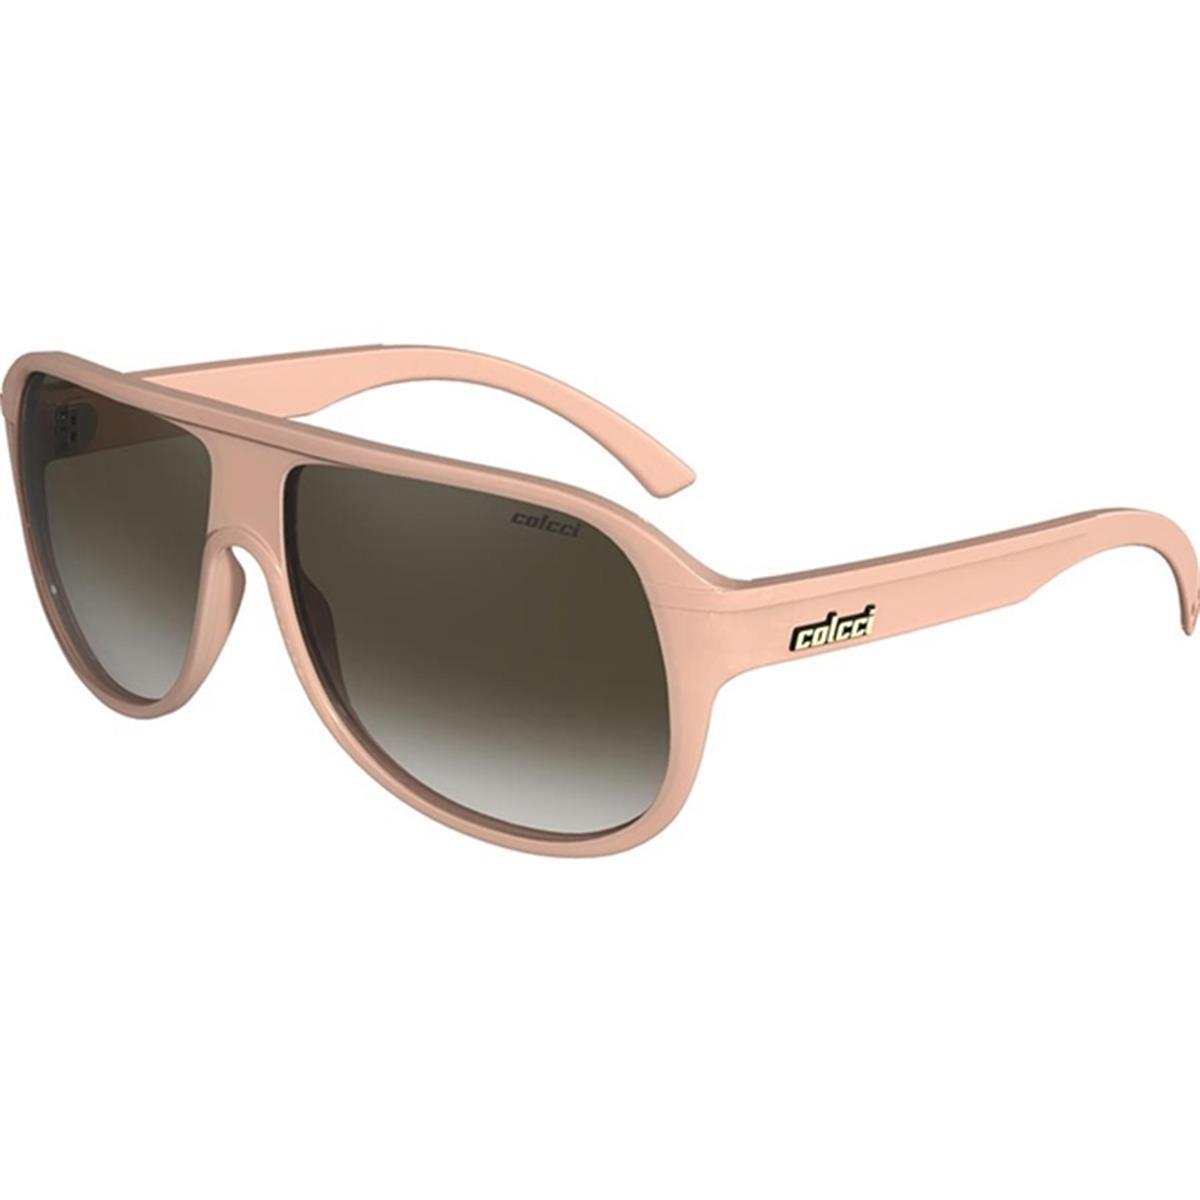 97cf1f531 Óculos de Sol Aviador Morion Feminino 5013 Colcci